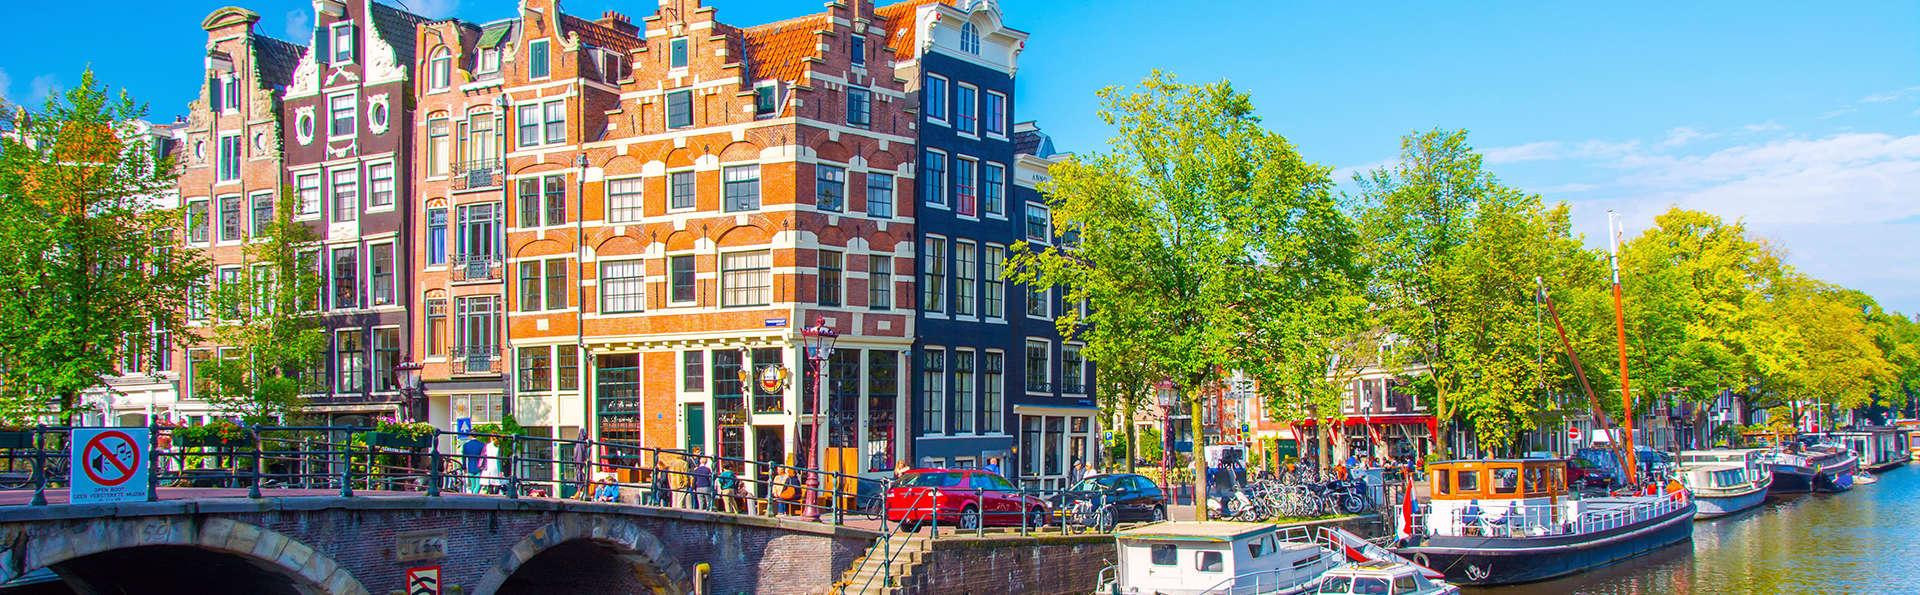 Oferta especial: 2 noches de lujo cerca de Amsterdam